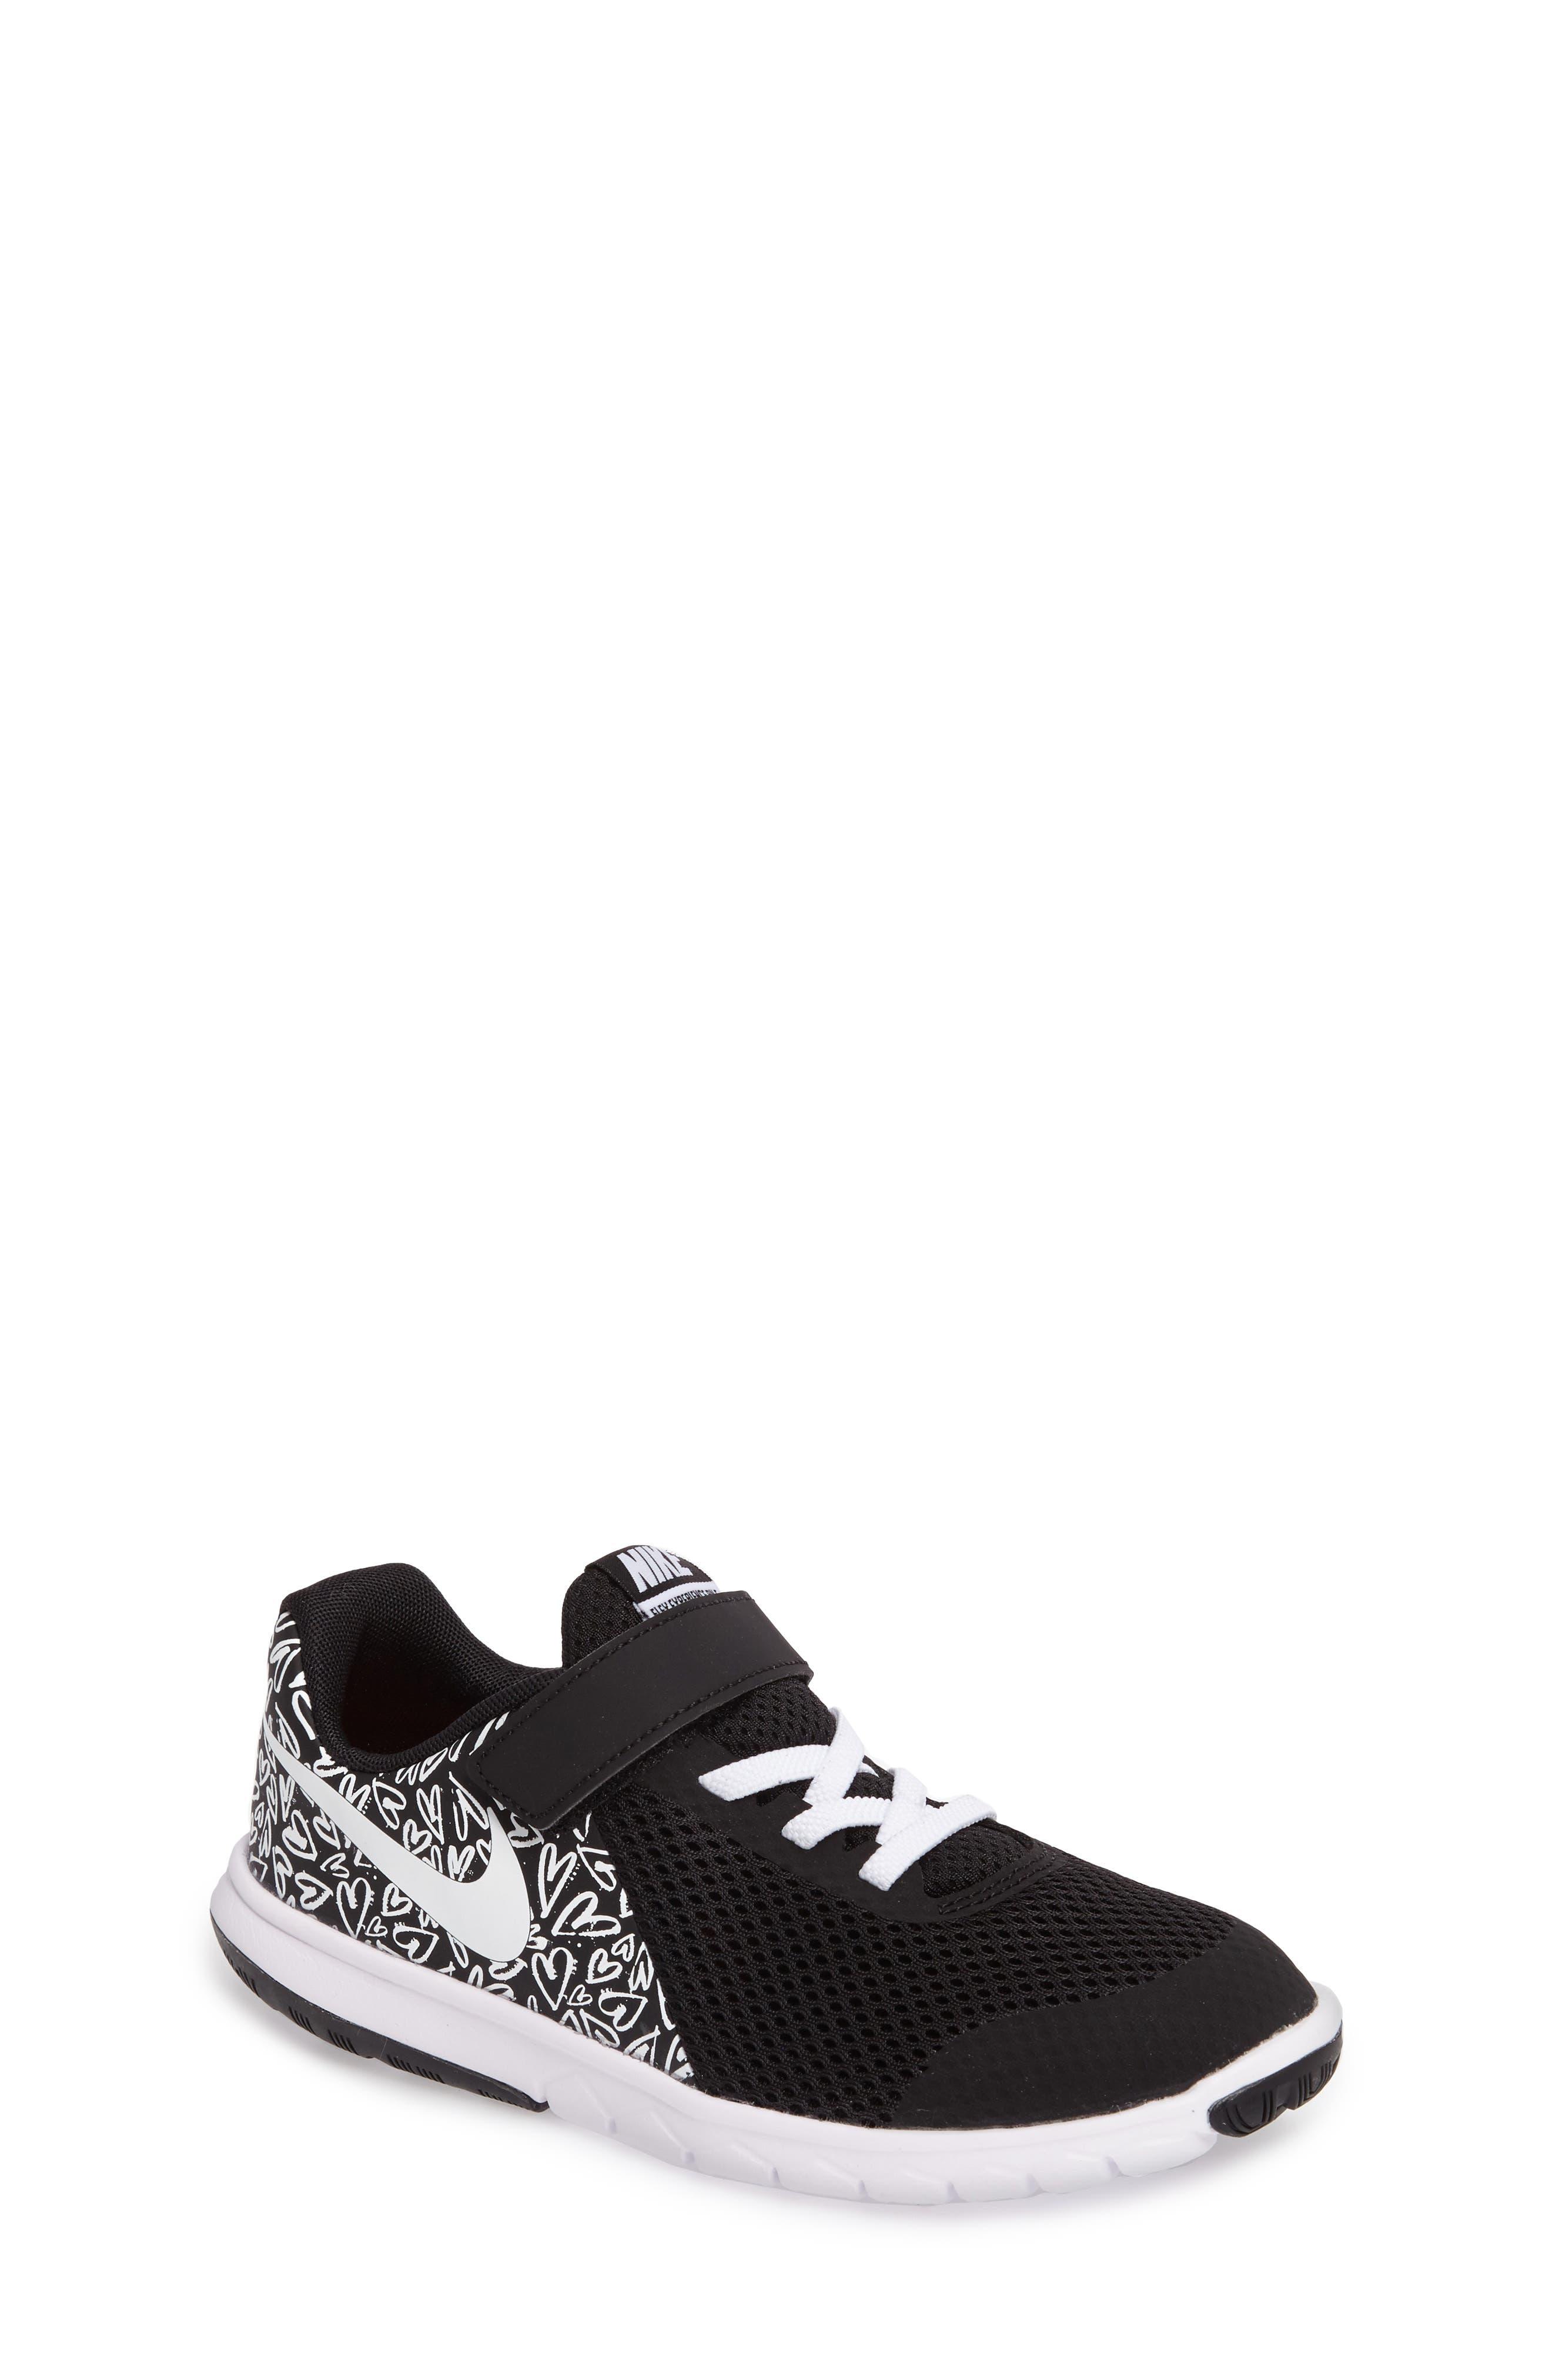 new concept 88e77 8bcec Nike Flex Experience Run Shoes Selling my wife s NIke jordan sneaker boots  Roshe Camo Women s ...